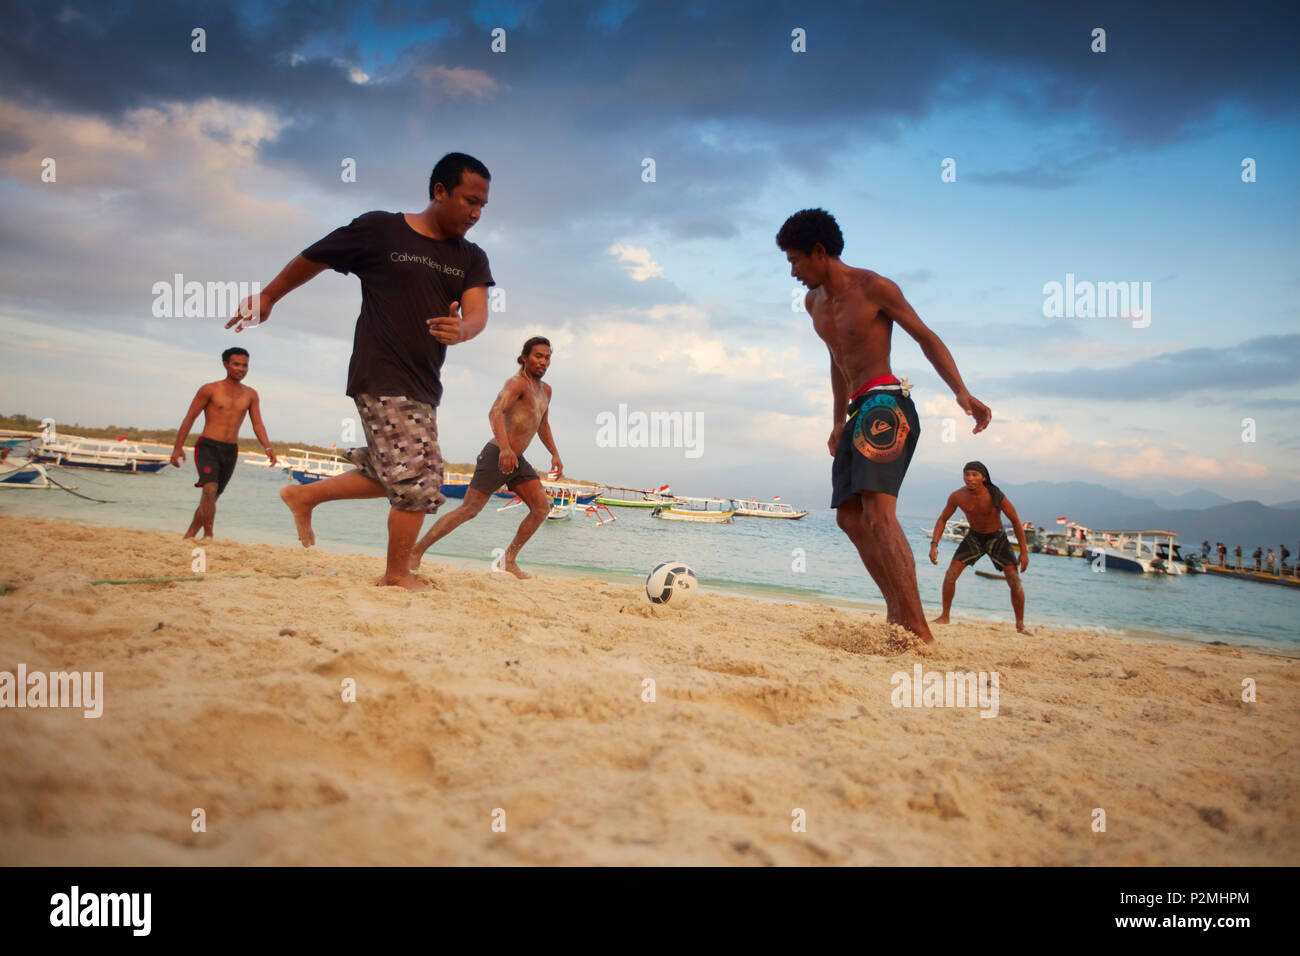 Les jeunes gens jouant au football sur Trawangan plage, Gili Trawangan, Lombok, Indonésie Photo Stock